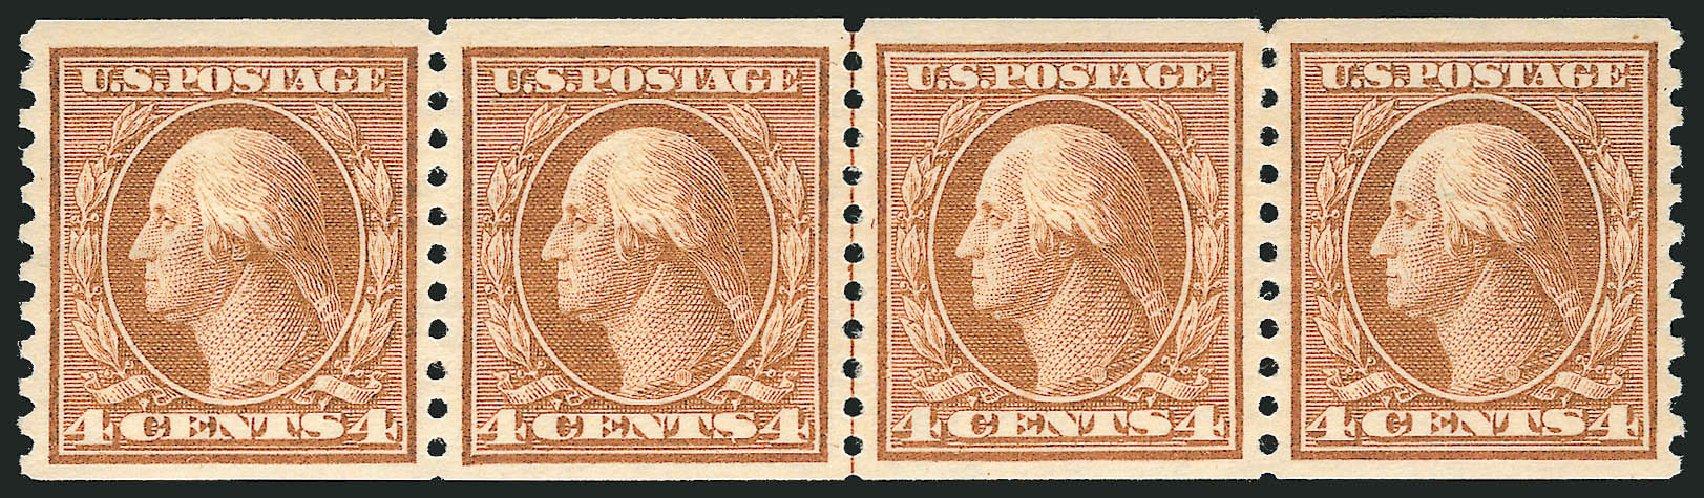 Costs of US Stamp Scott Cat. # 457: 1915 4c Washington Coil Perf 10 Vertically. Robert Siegel Auction Galleries, Feb 2015, Sale 1093, Lot 368